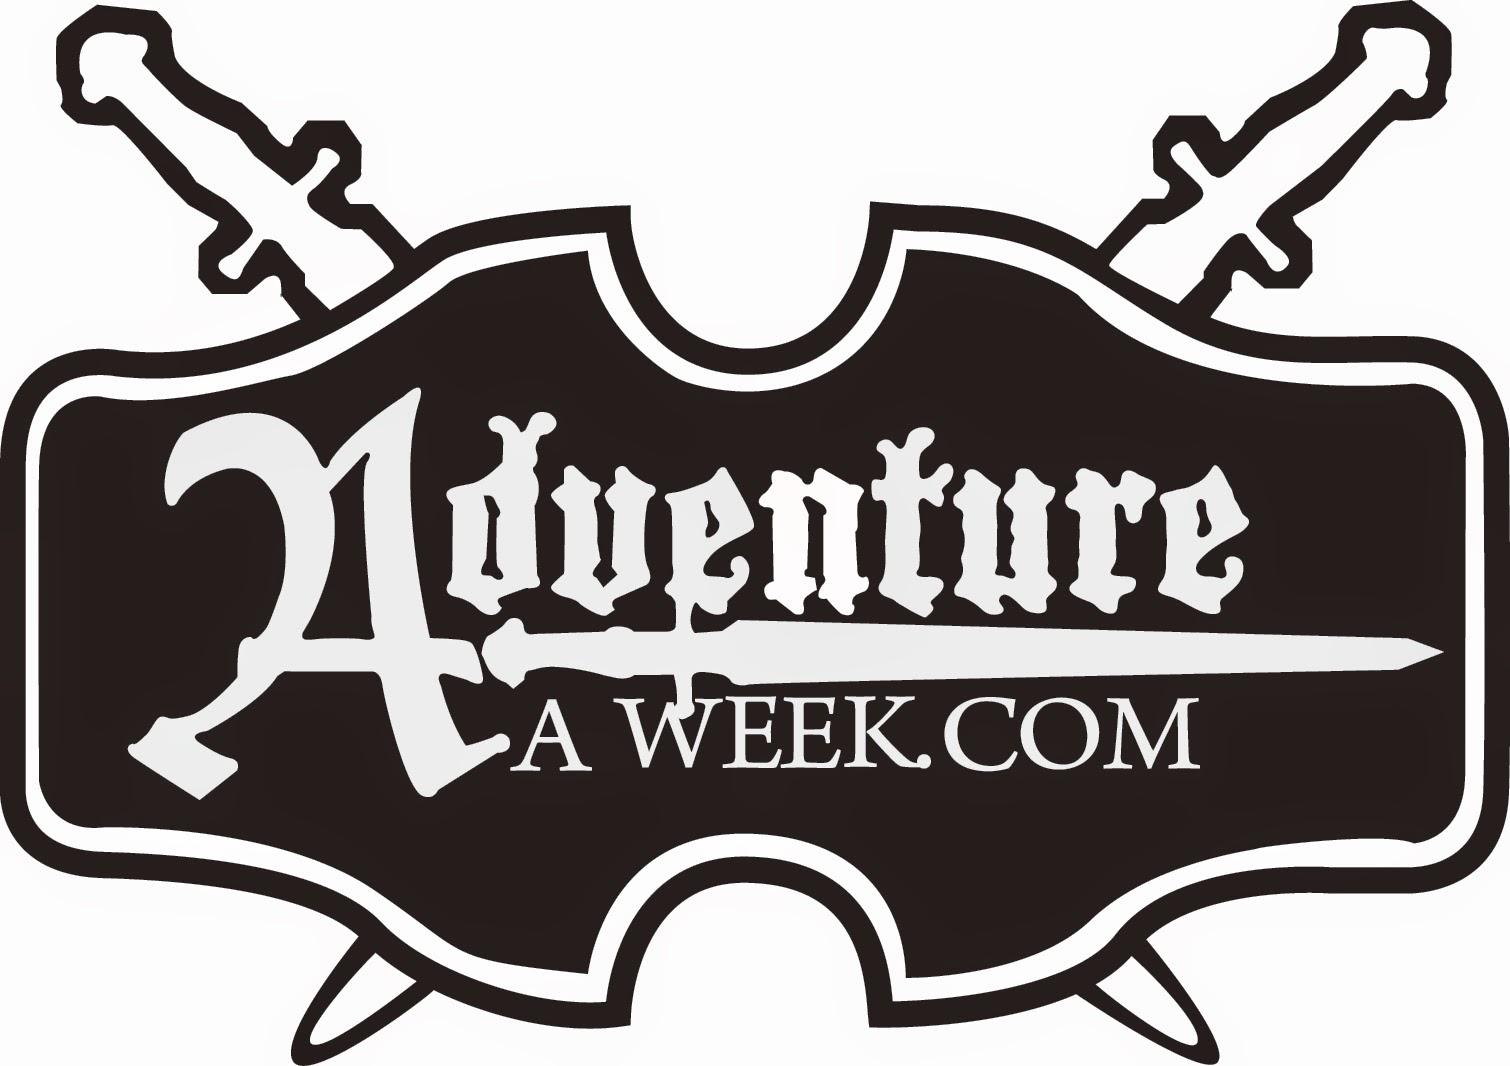 http://adventureaweek.com/